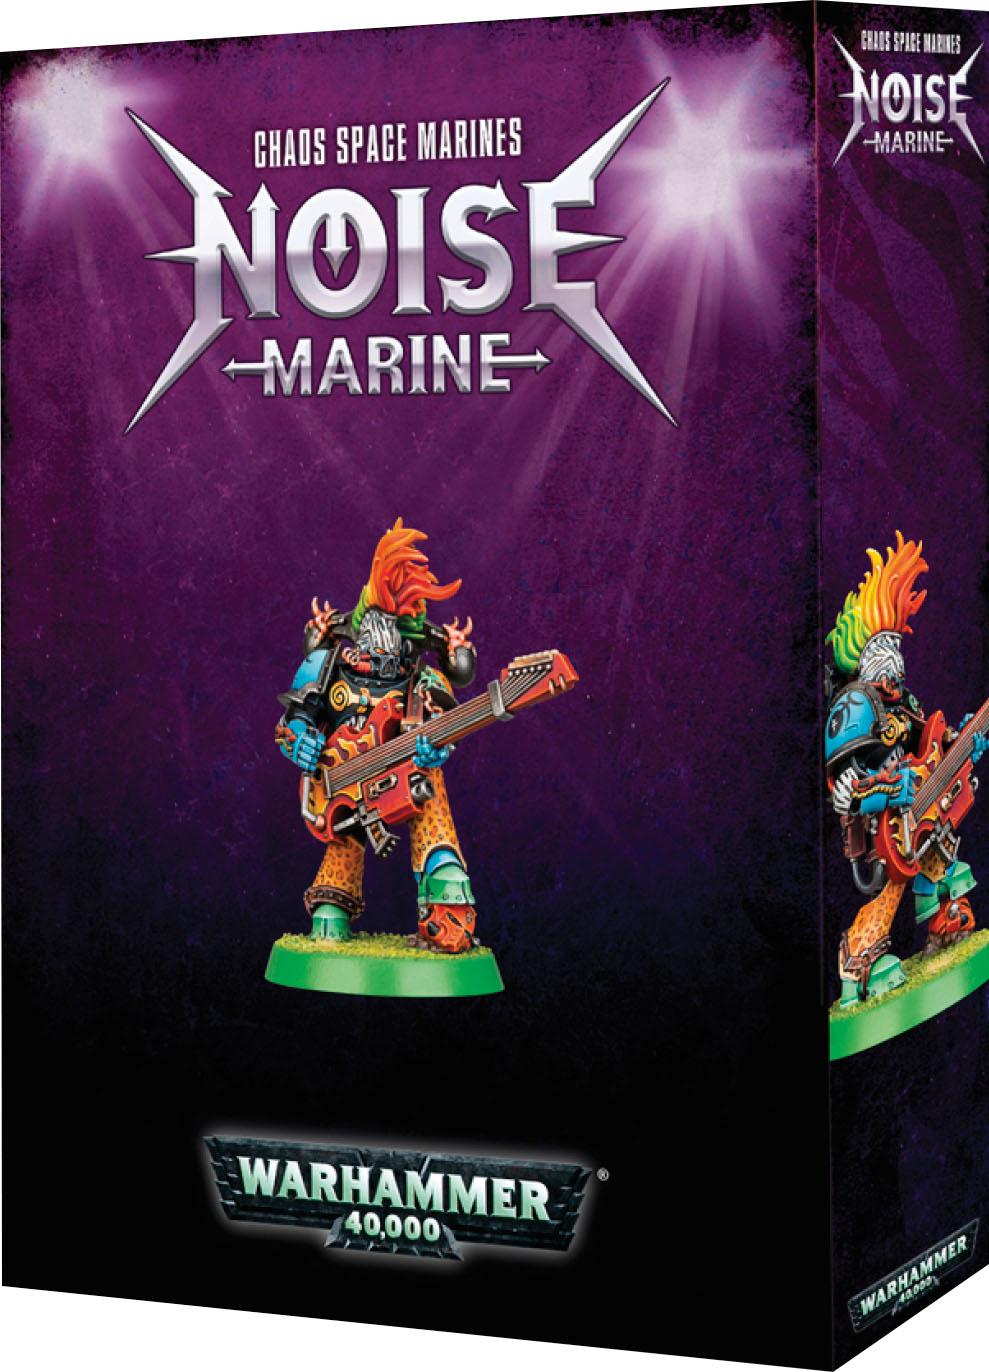 Warhammer 40k: Chaos Space Marine Noise Marine Game Box